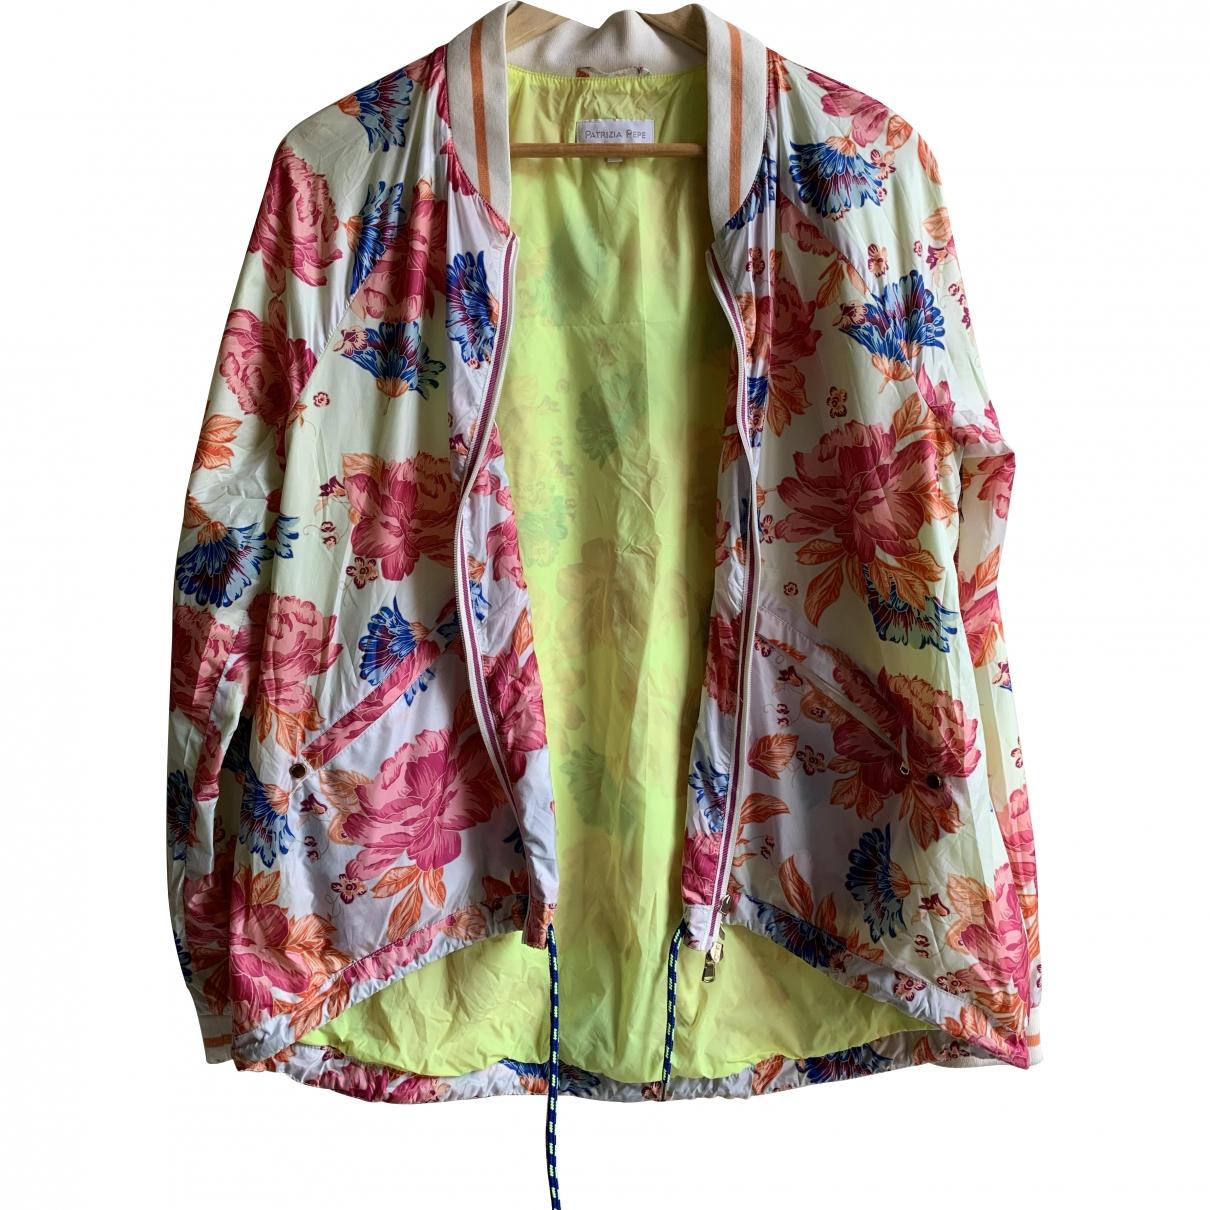 Patrizia Pepe \N Multicolour jacket for Women 44 IT